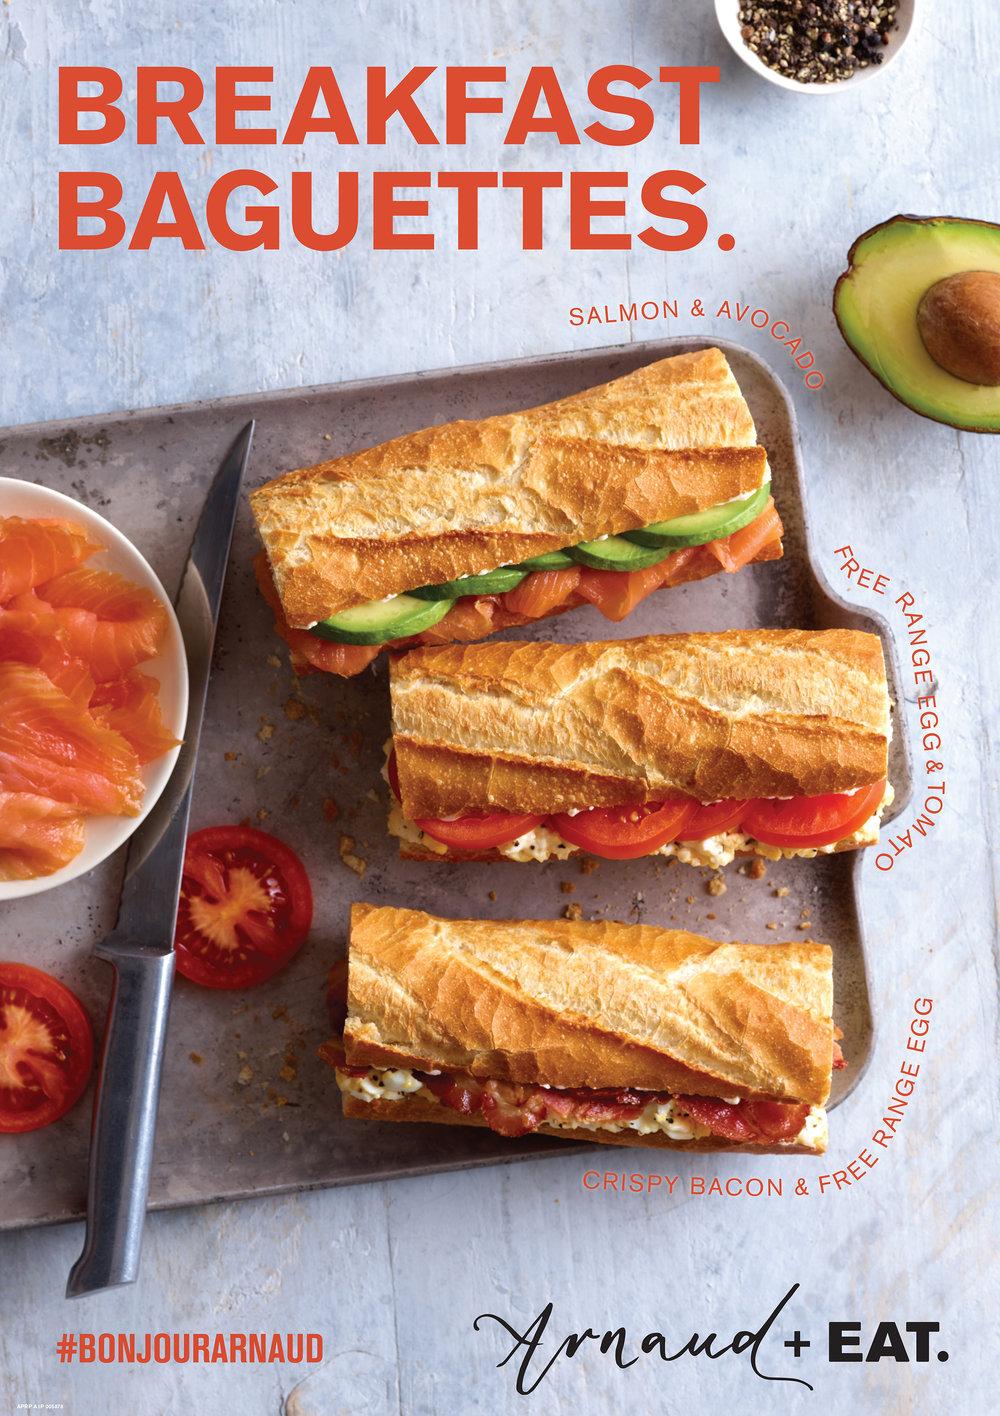 APRP A1P 005878 Breakfast Baguette Range A1 AW.jpg